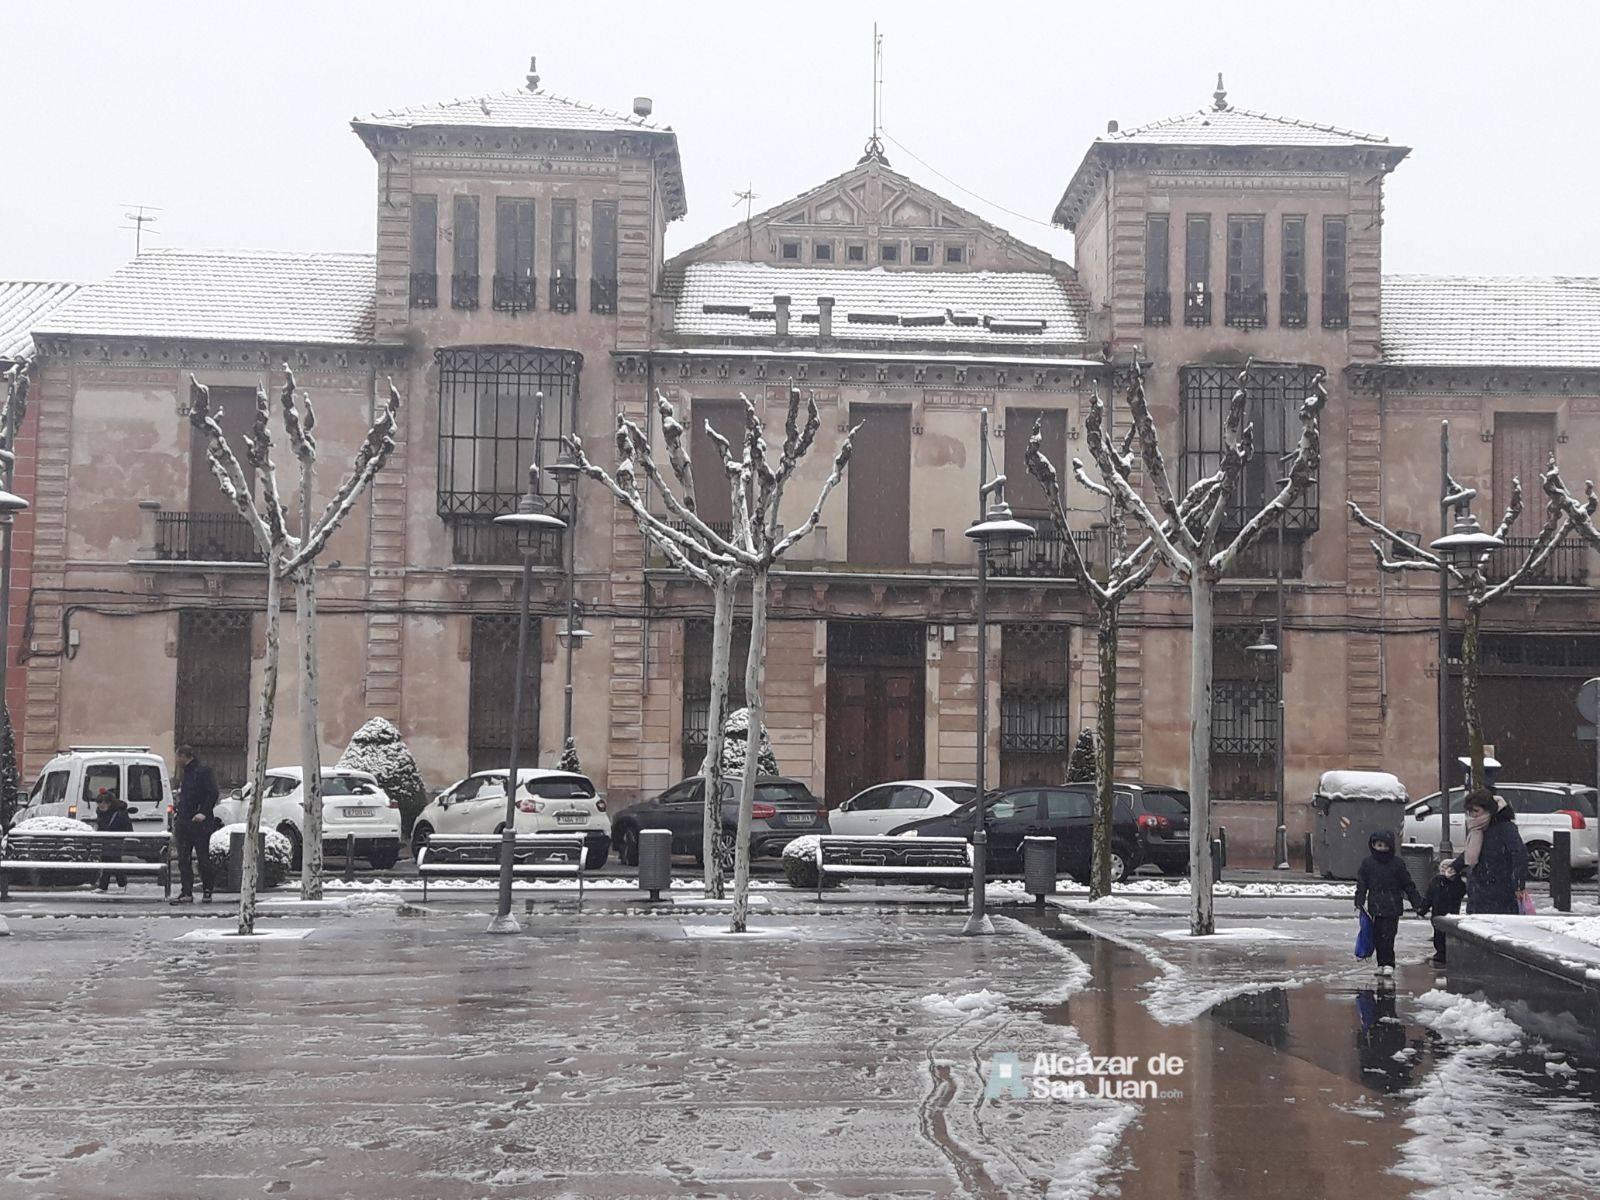 alcazar-calles-nieve-2 1